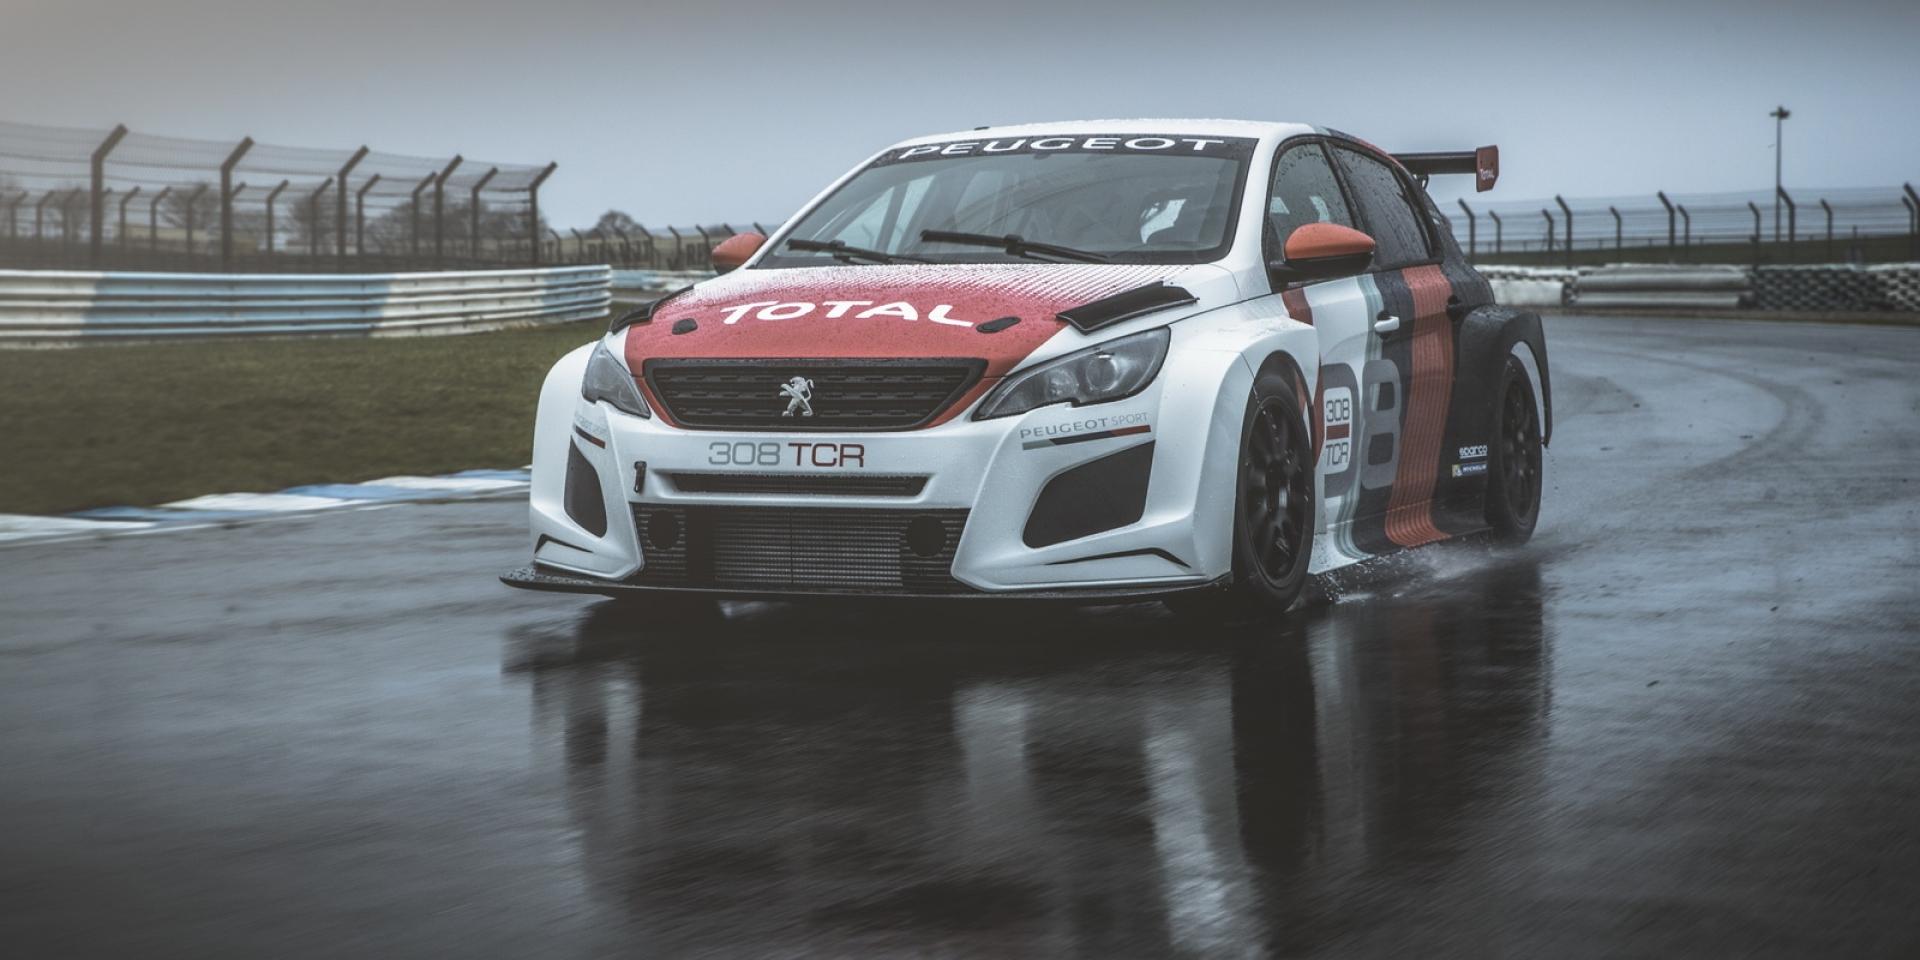 性能更強大,Peugeot 308 Racing Cup進化308 TCR